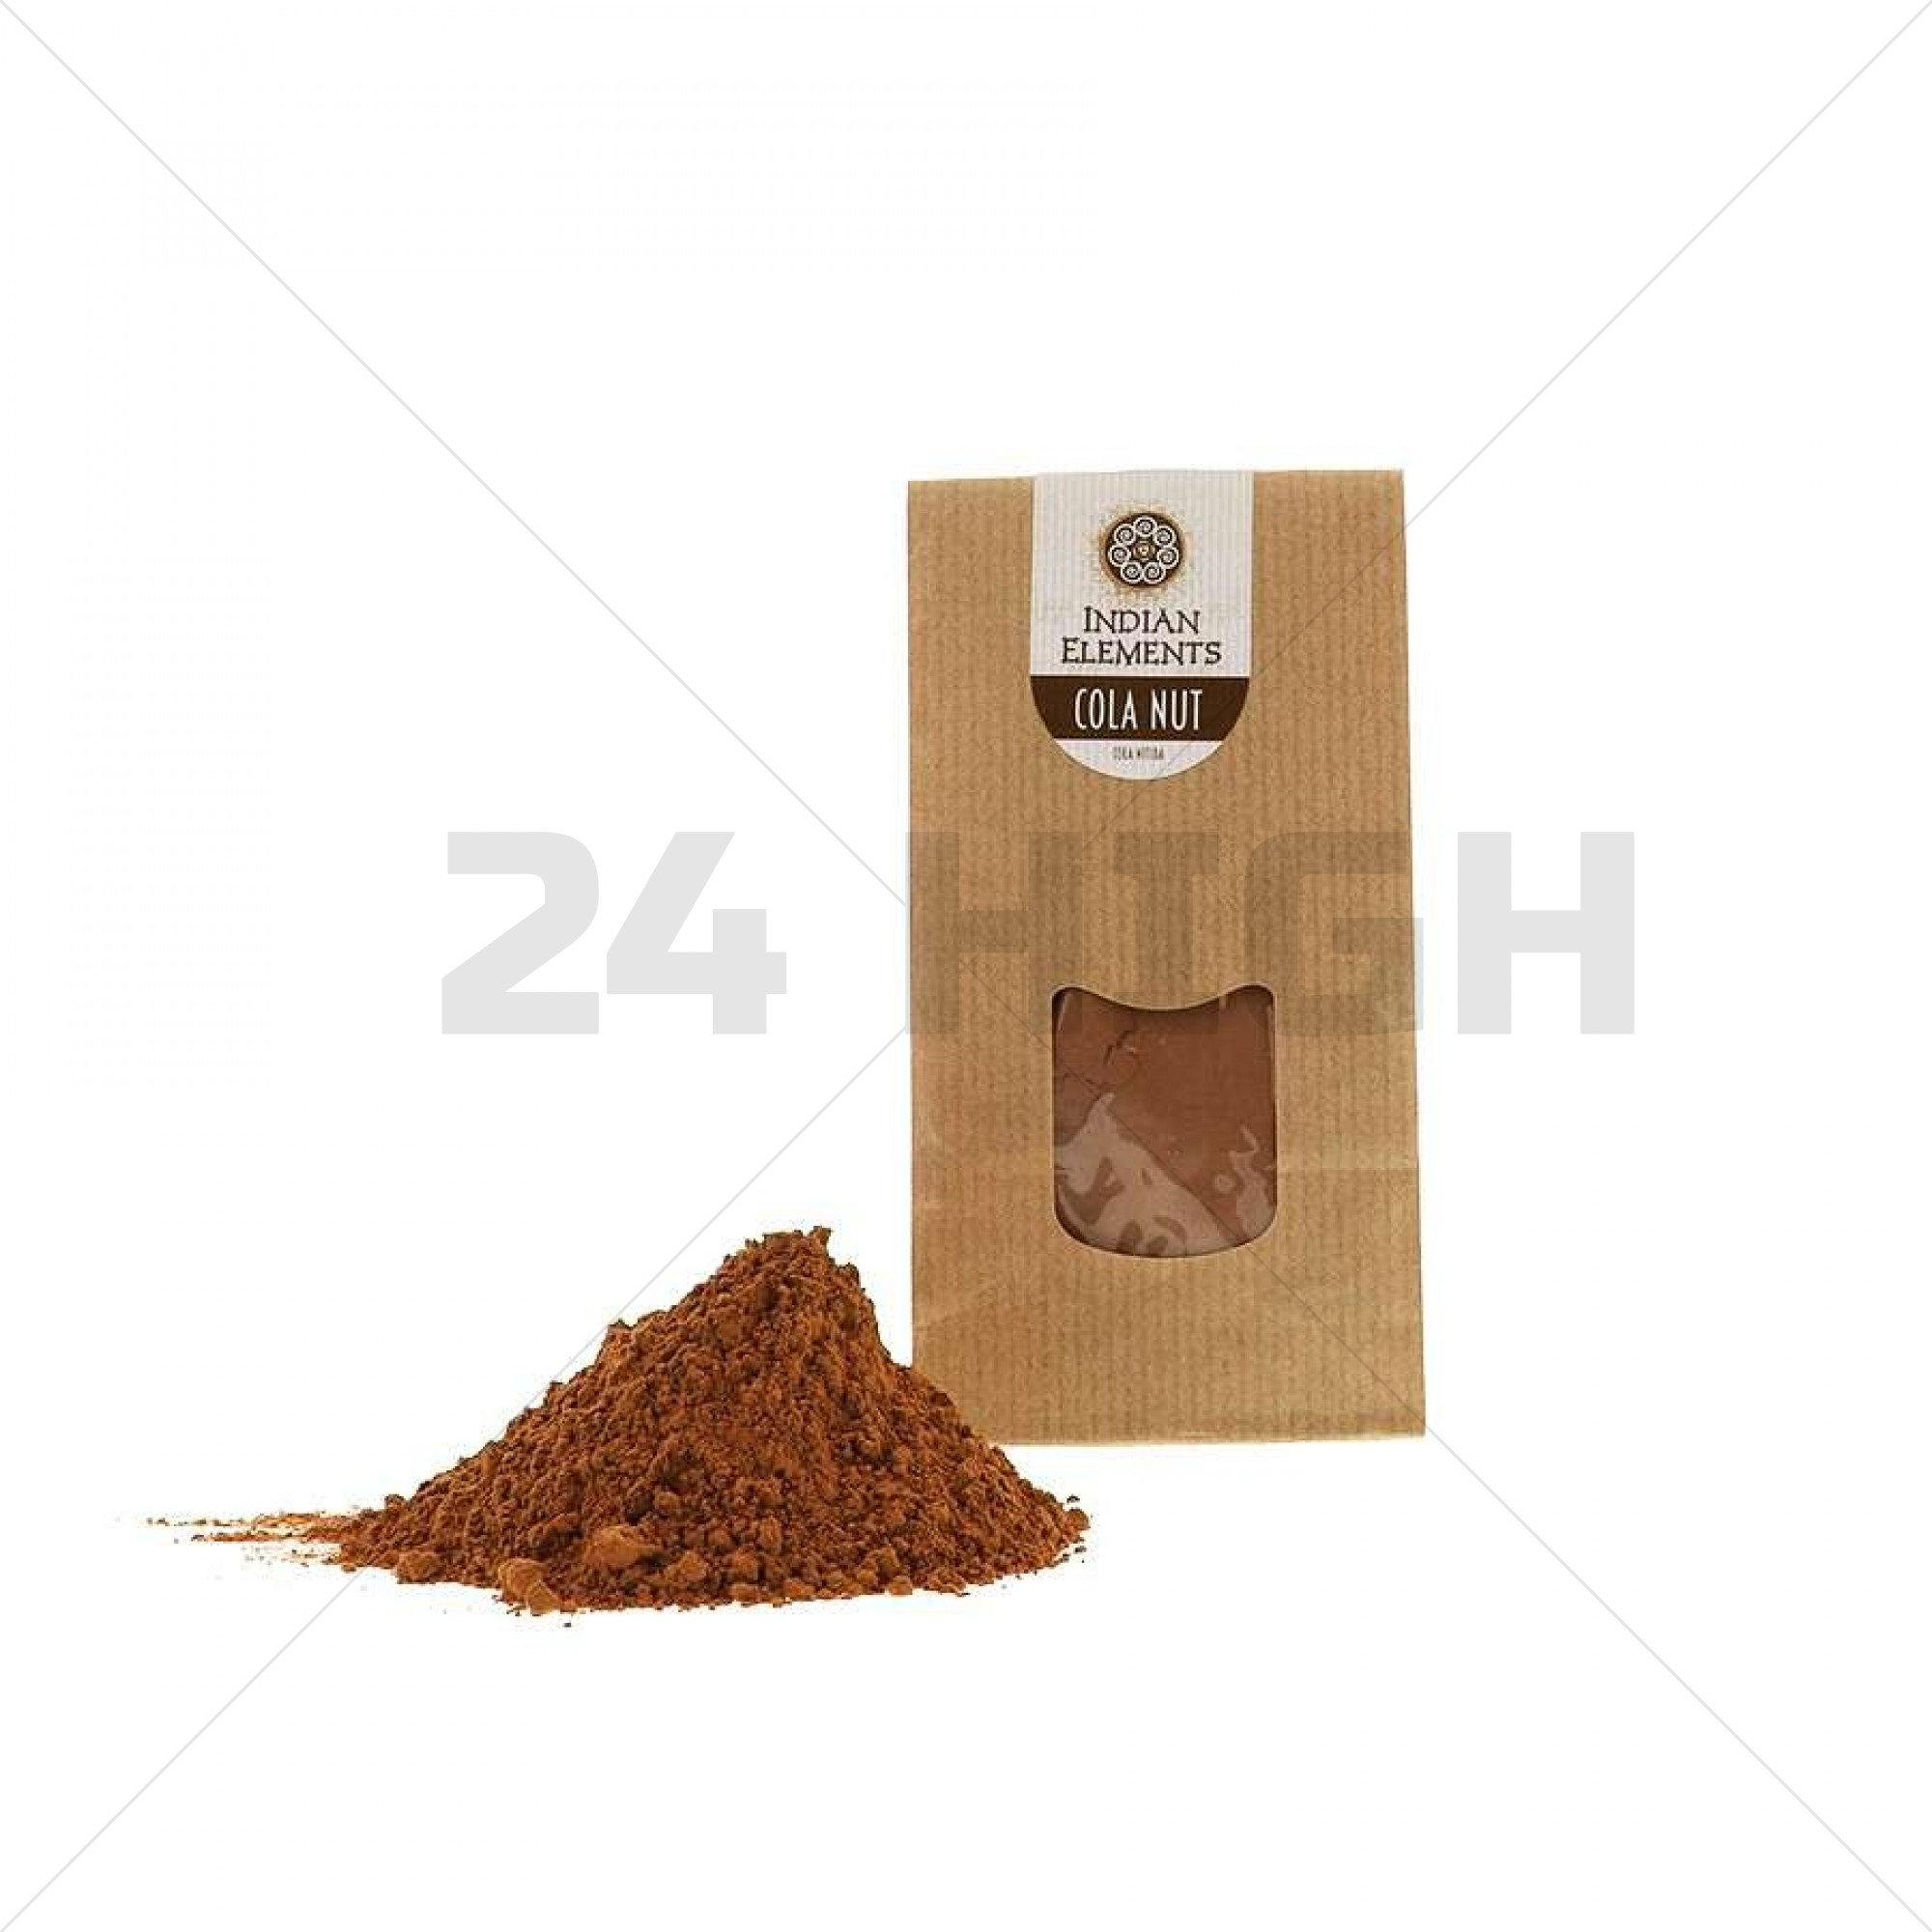 Cola Nut Indian Elements